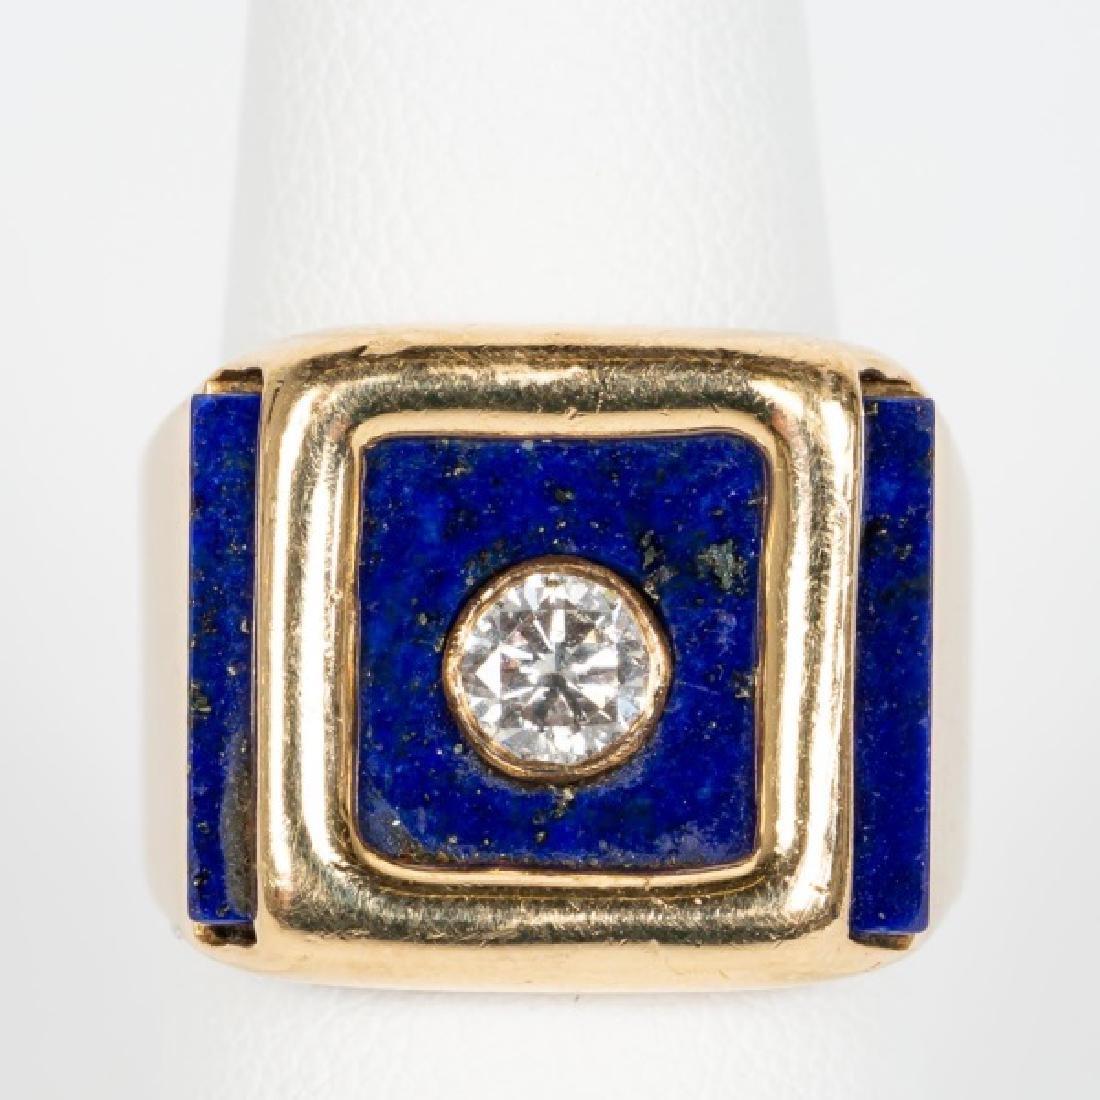 14k Yellow Gold, Lapis Lazuli, & Diamond Ring